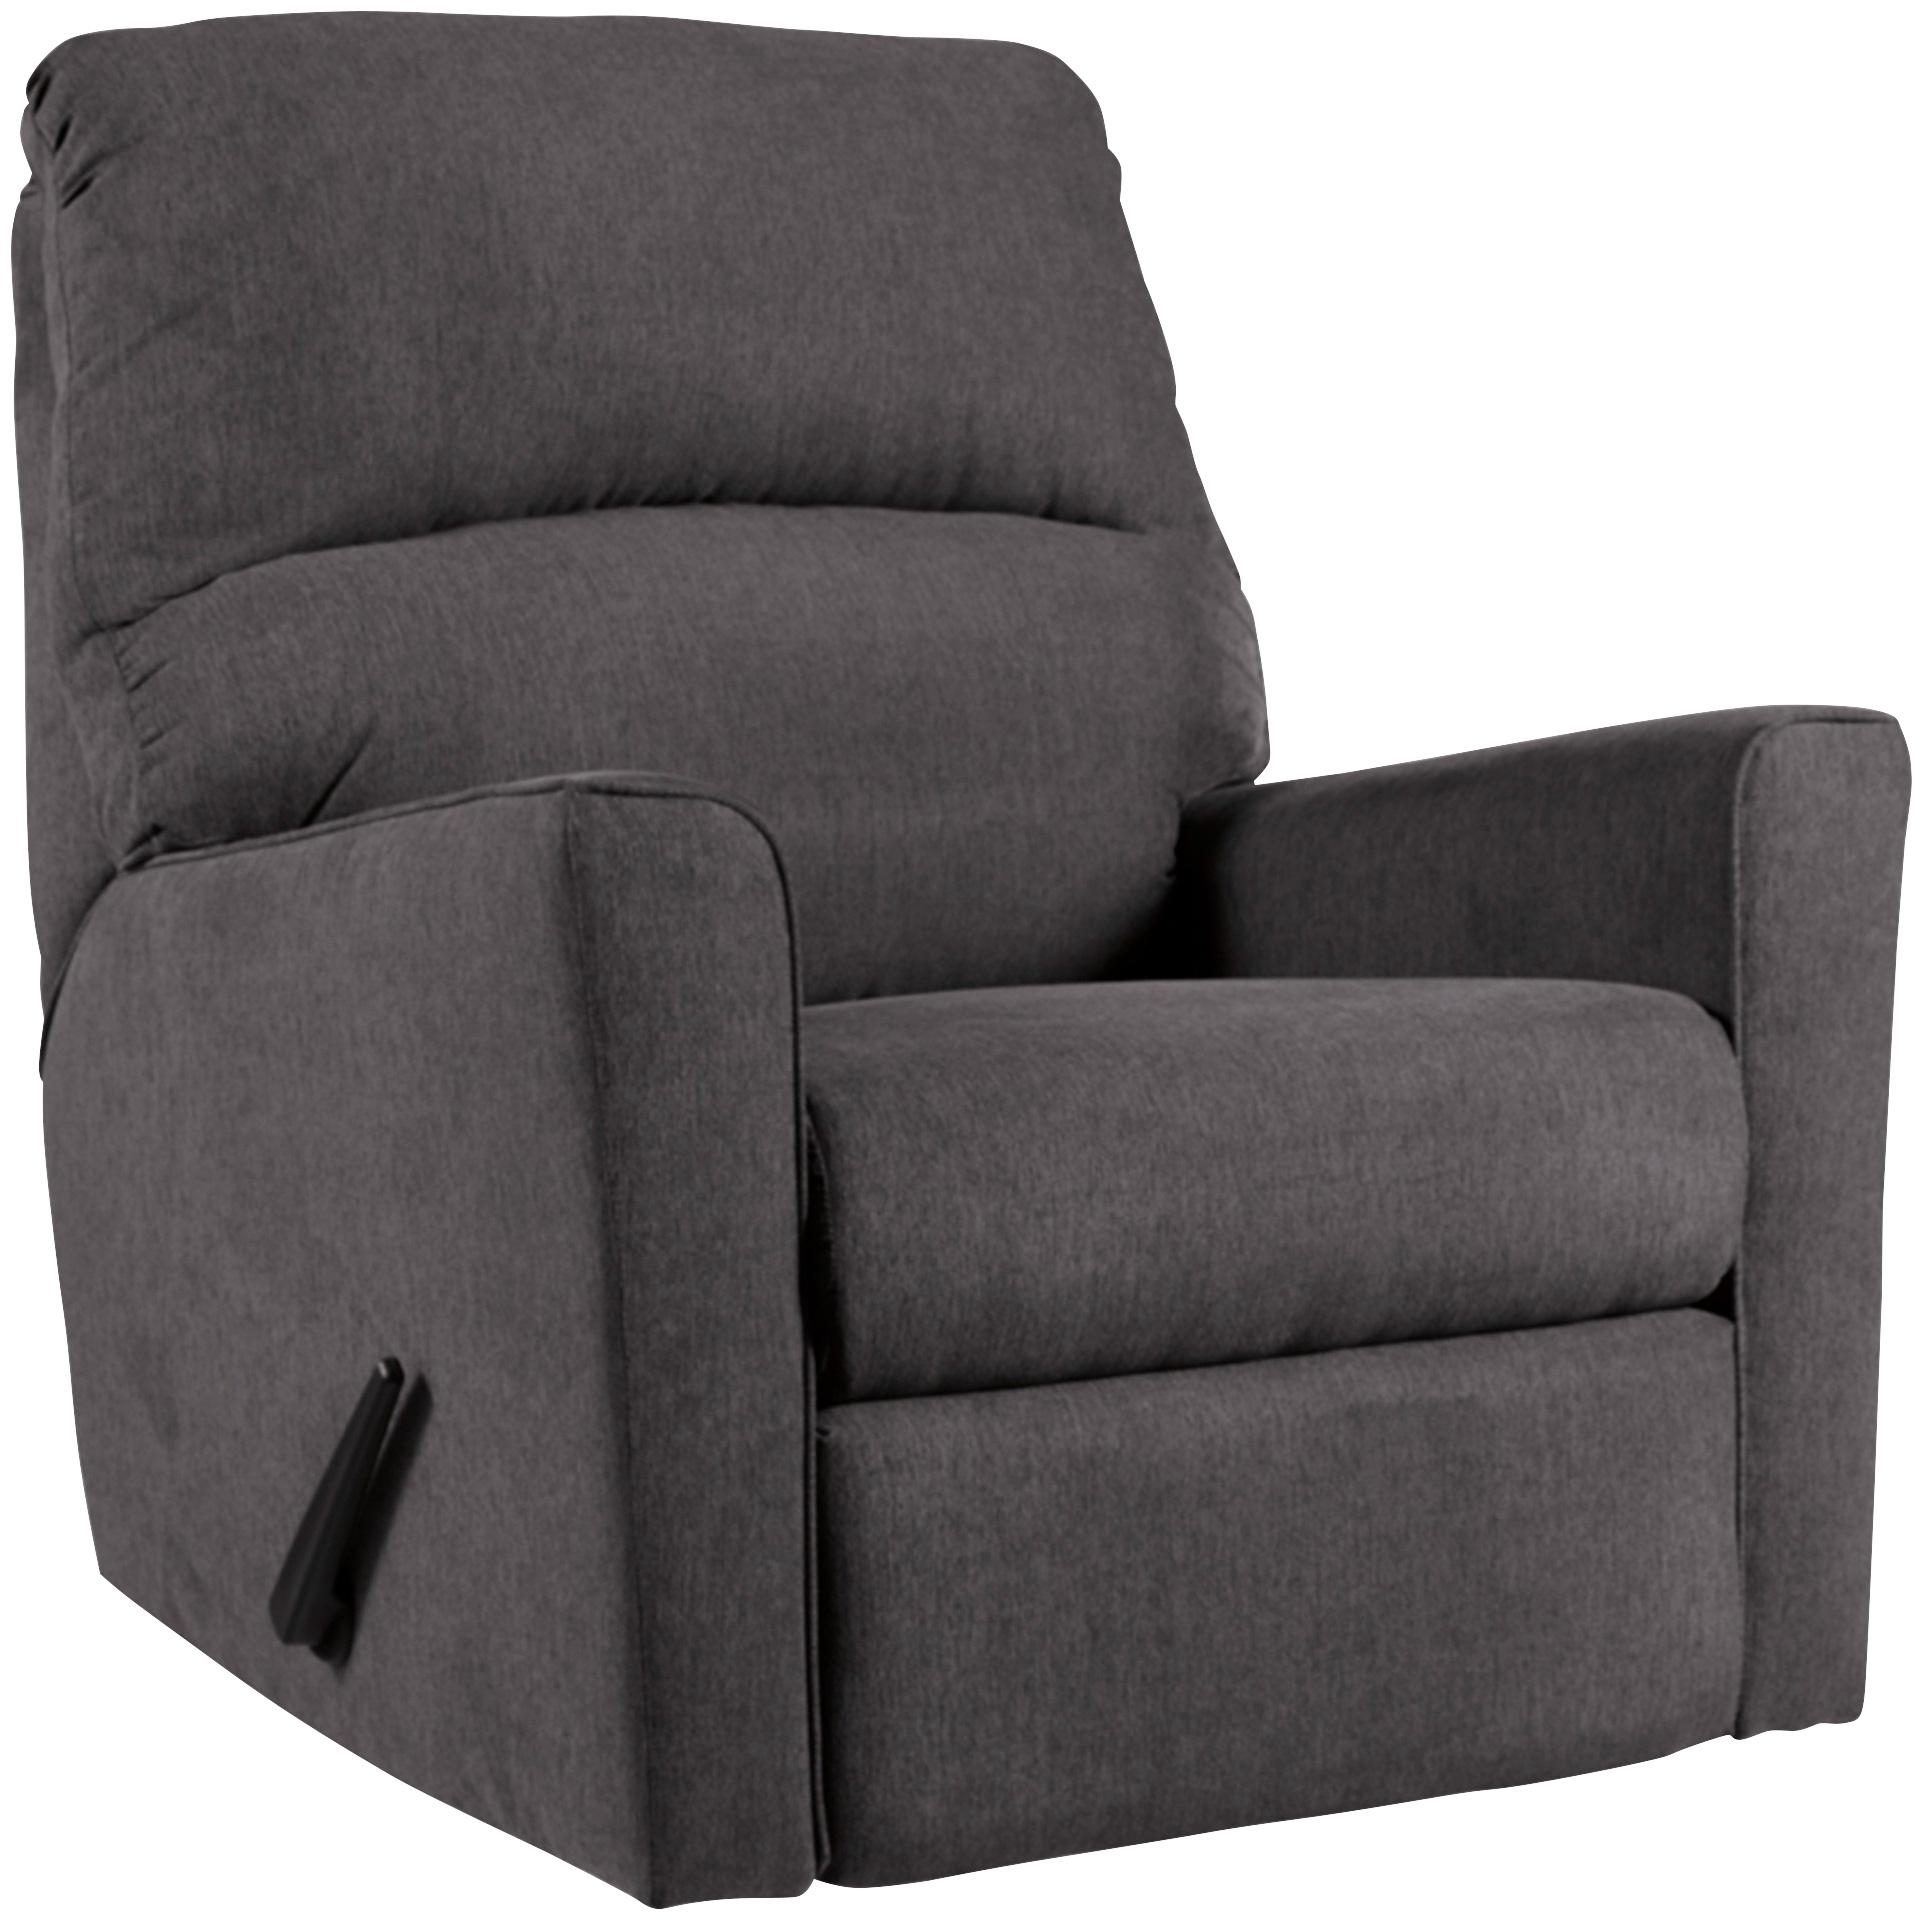 Ashley Furniture | Alenya Charcoal Rocker Recliner Chair